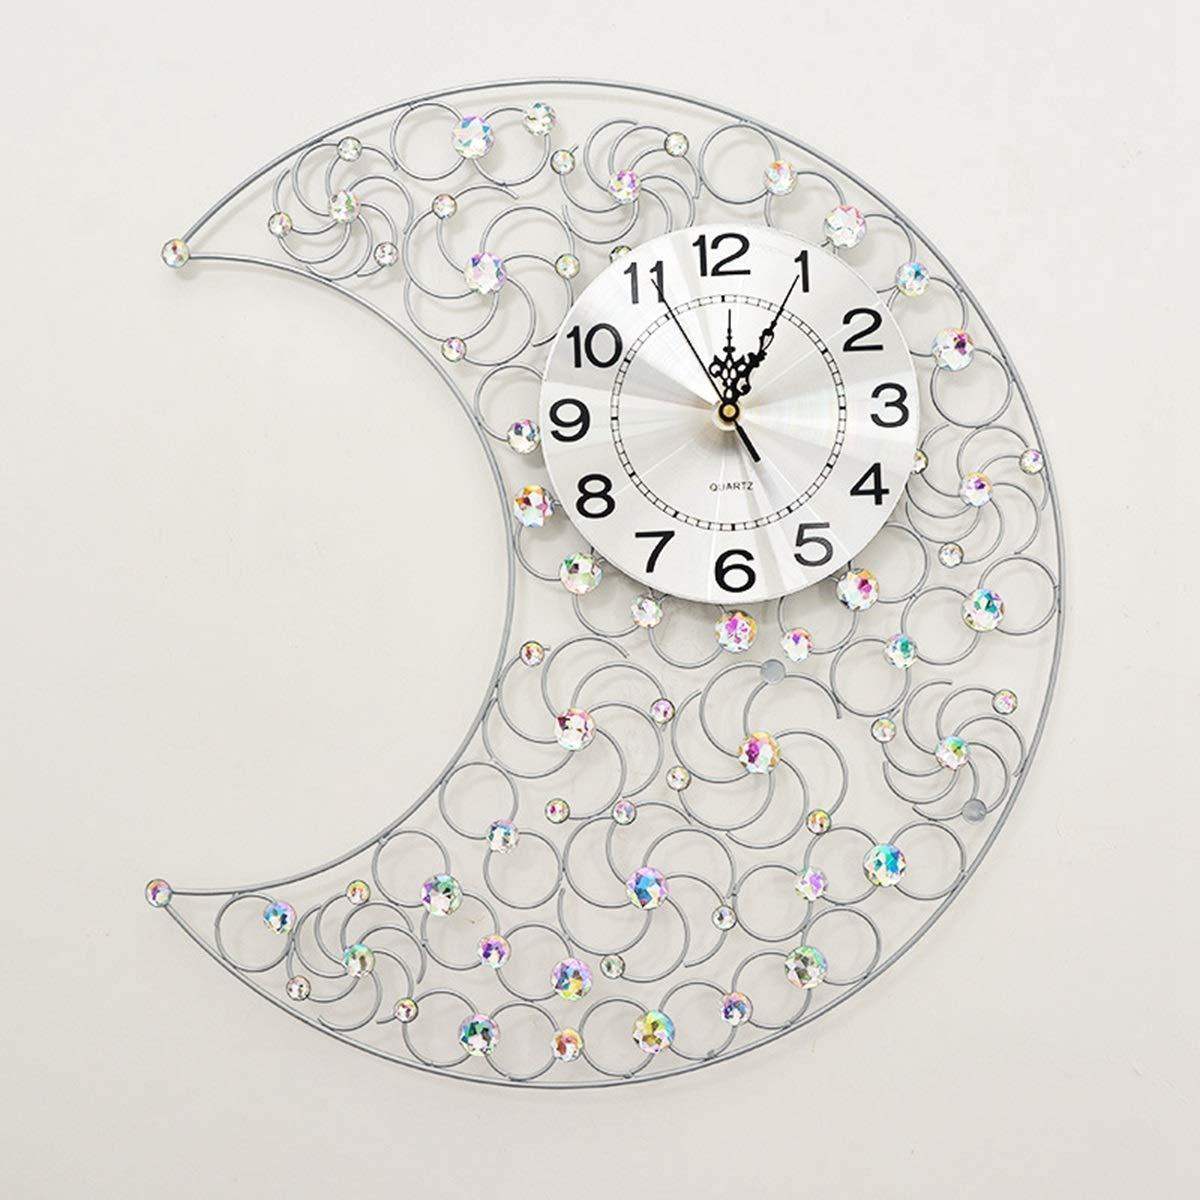 Chennong 現代大きい月の水晶ダイヤモンドの居間のための錬鉄の柱時計の水晶無声壁時計 (Color : Silver)  Silver B07R9WF4GB